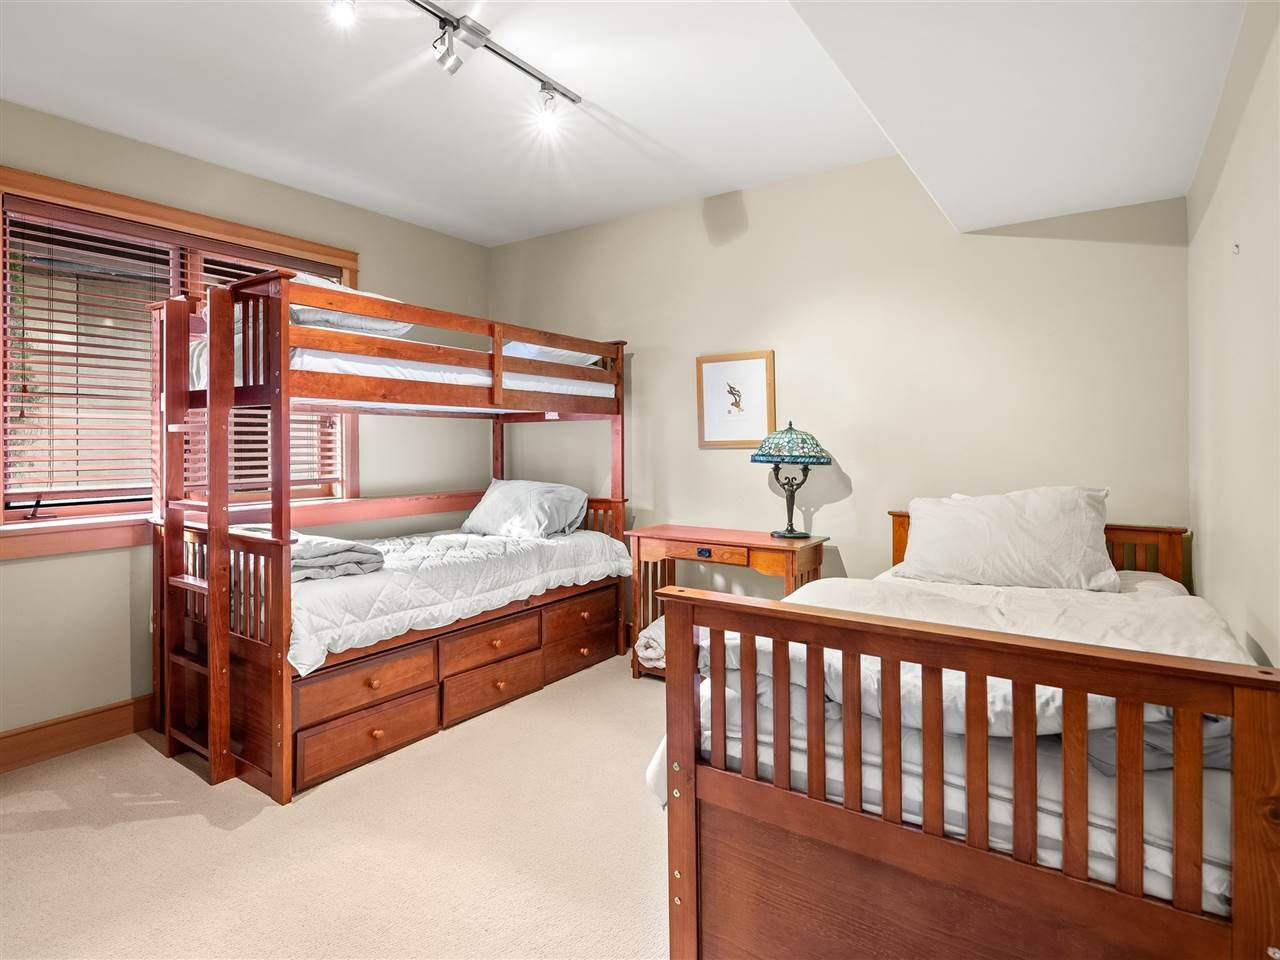 Photo 34: Photos: 1766 PINEWOOD DRIVE: Pemberton House for sale : MLS®# R2543608